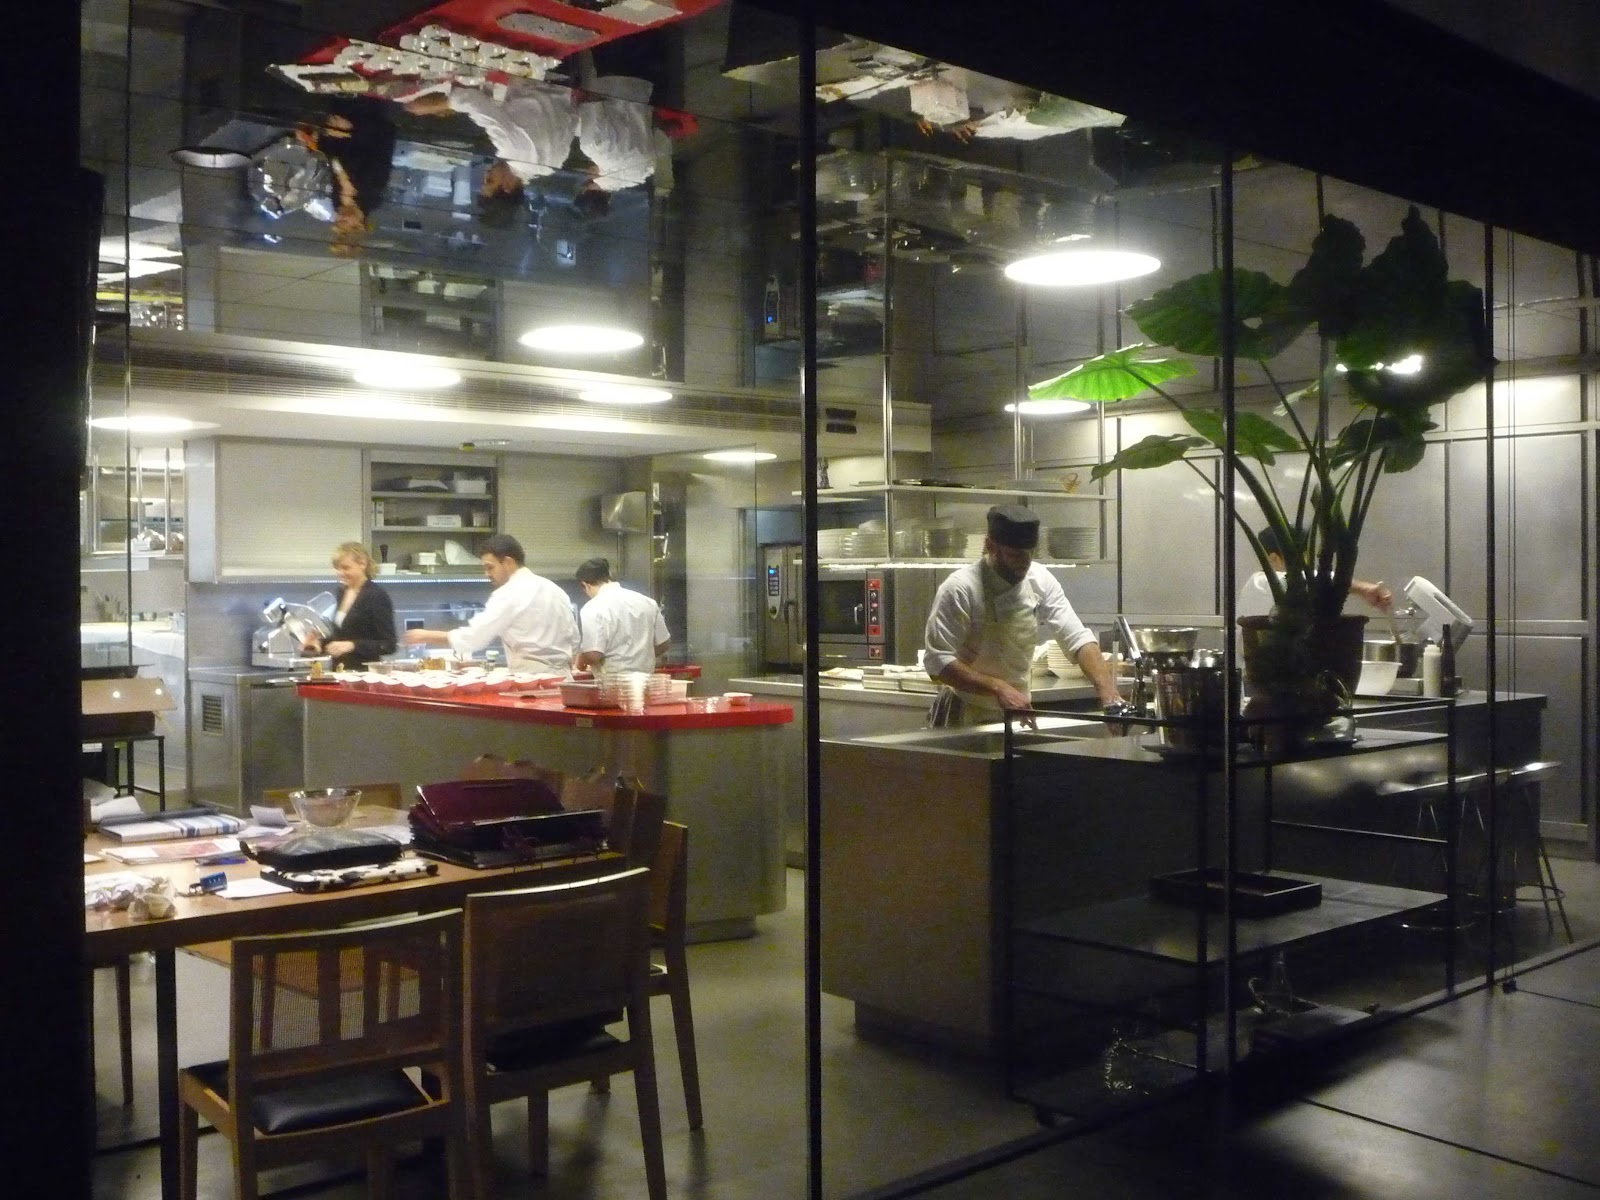 Mis restaurantes can jubany for Cocina de restaurante